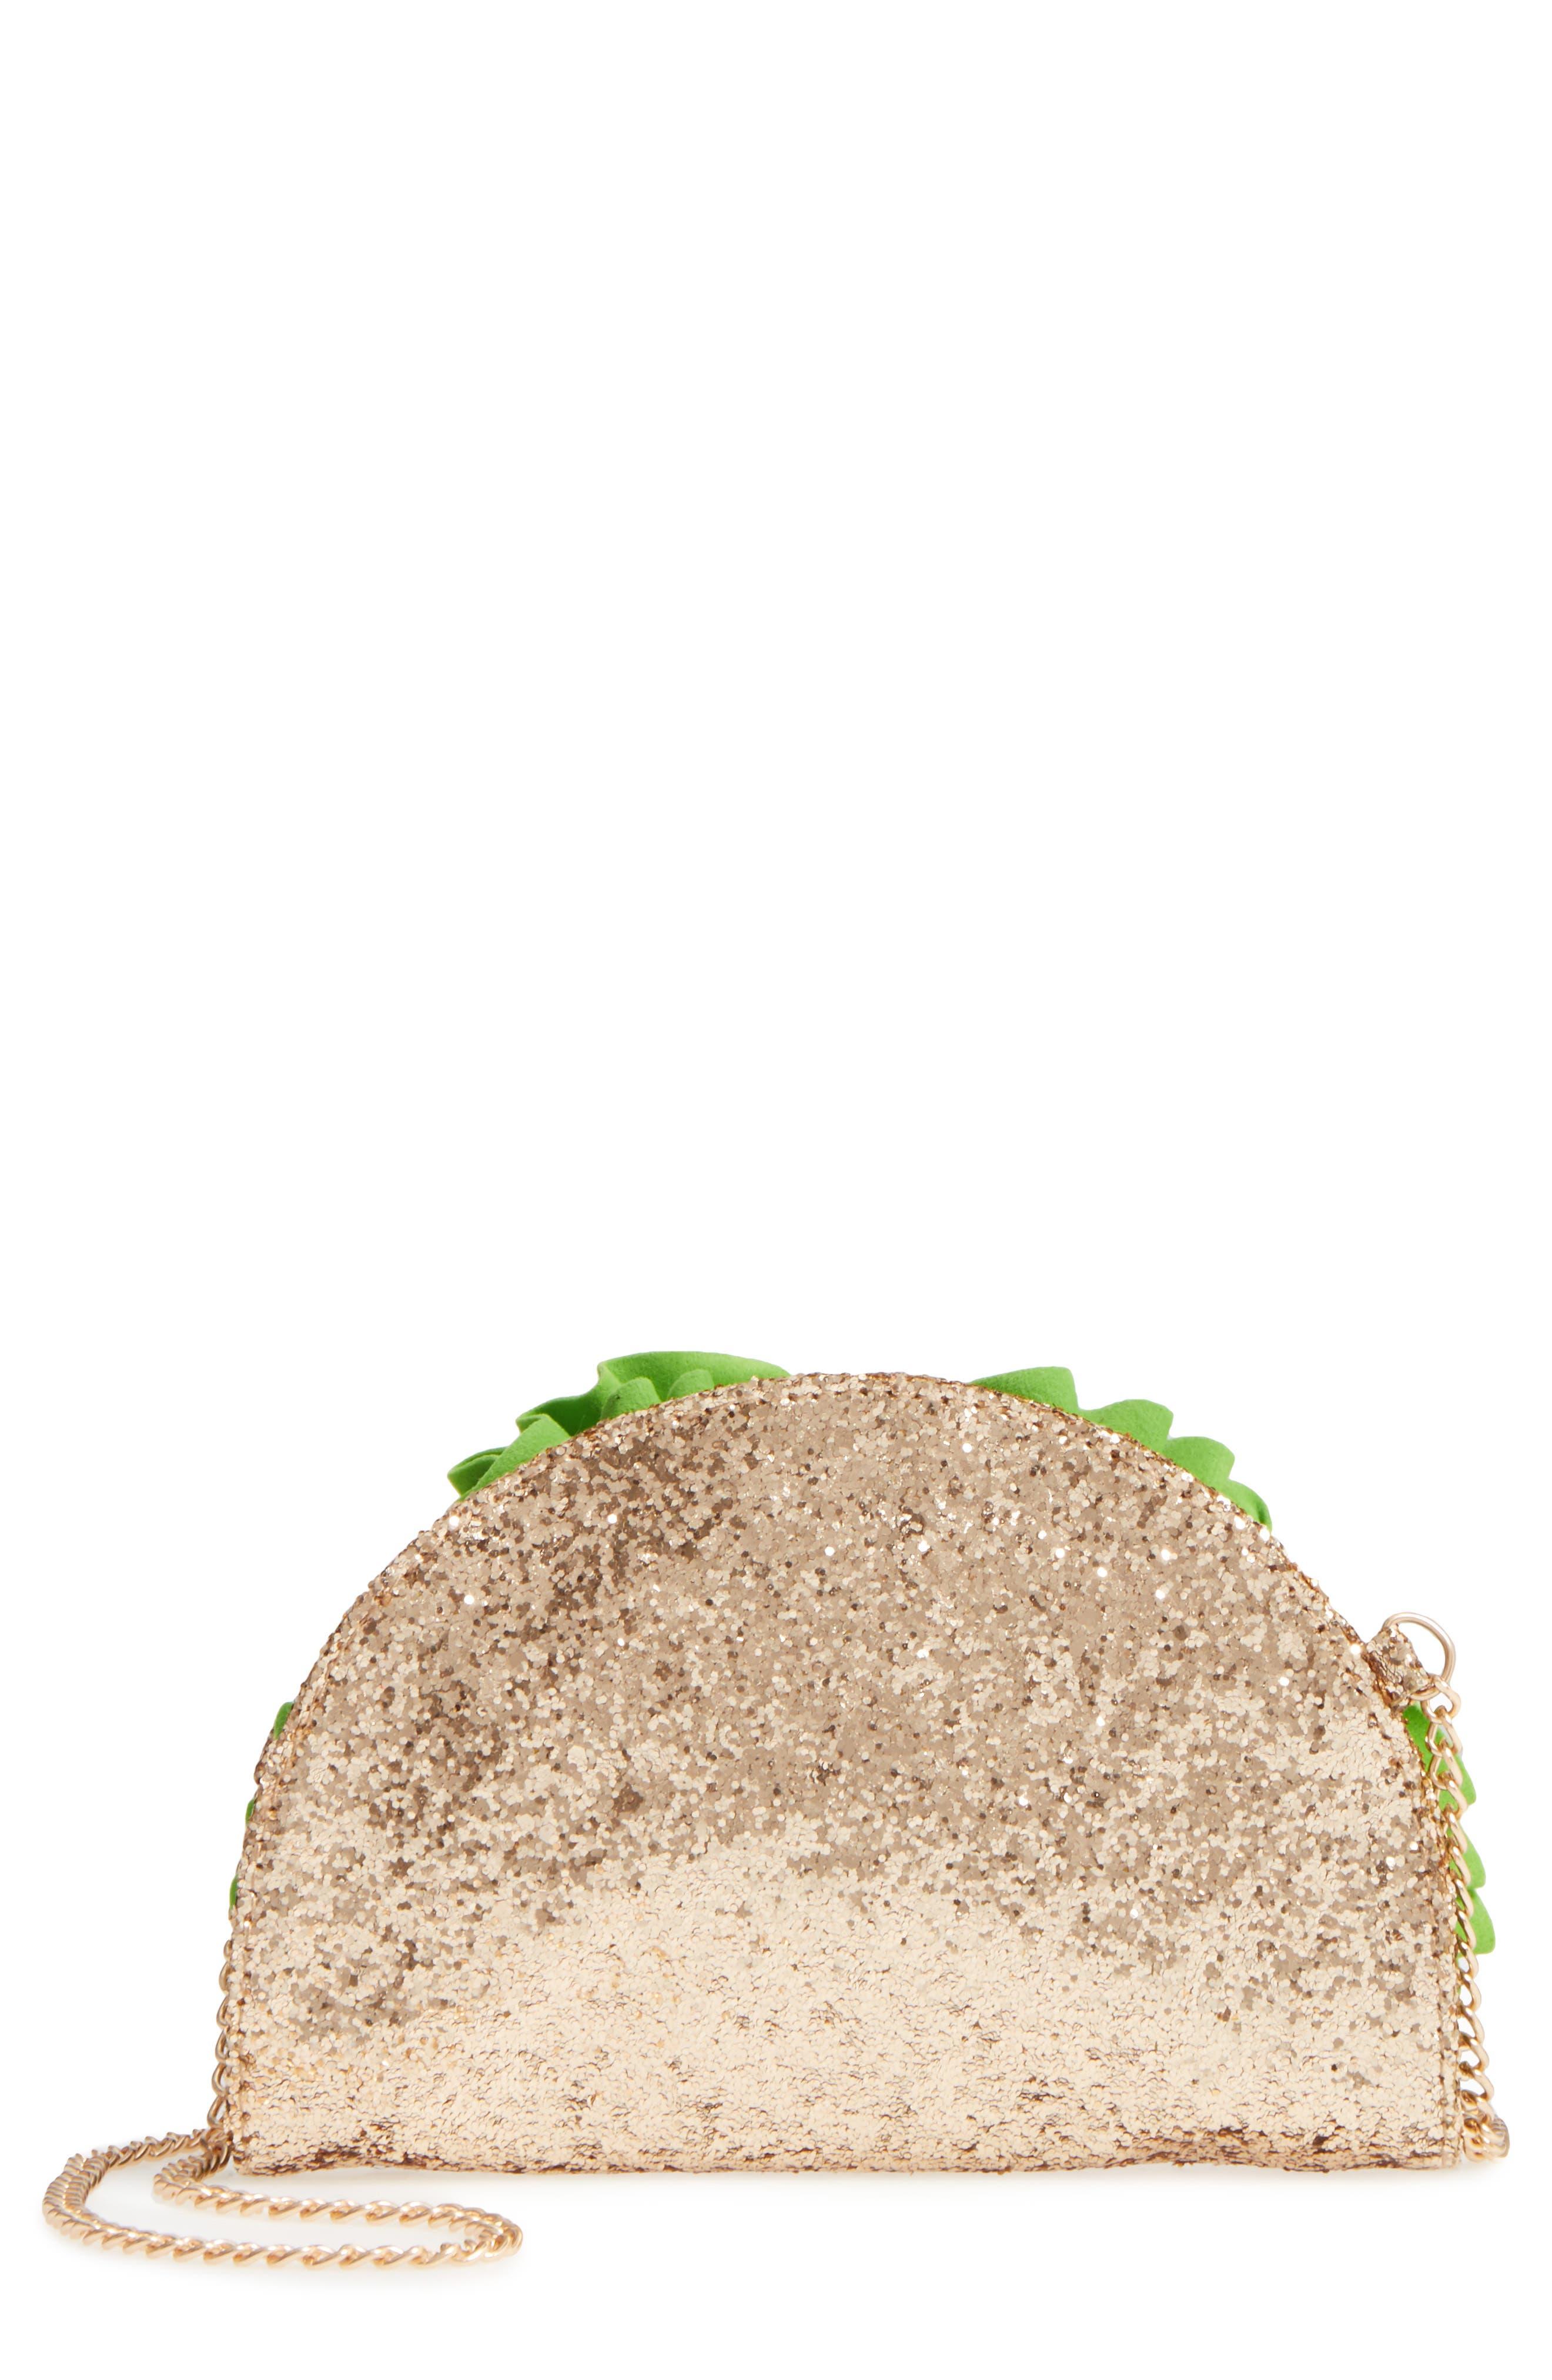 CAPELLI OF NEW YORK Glitter Taco Bag